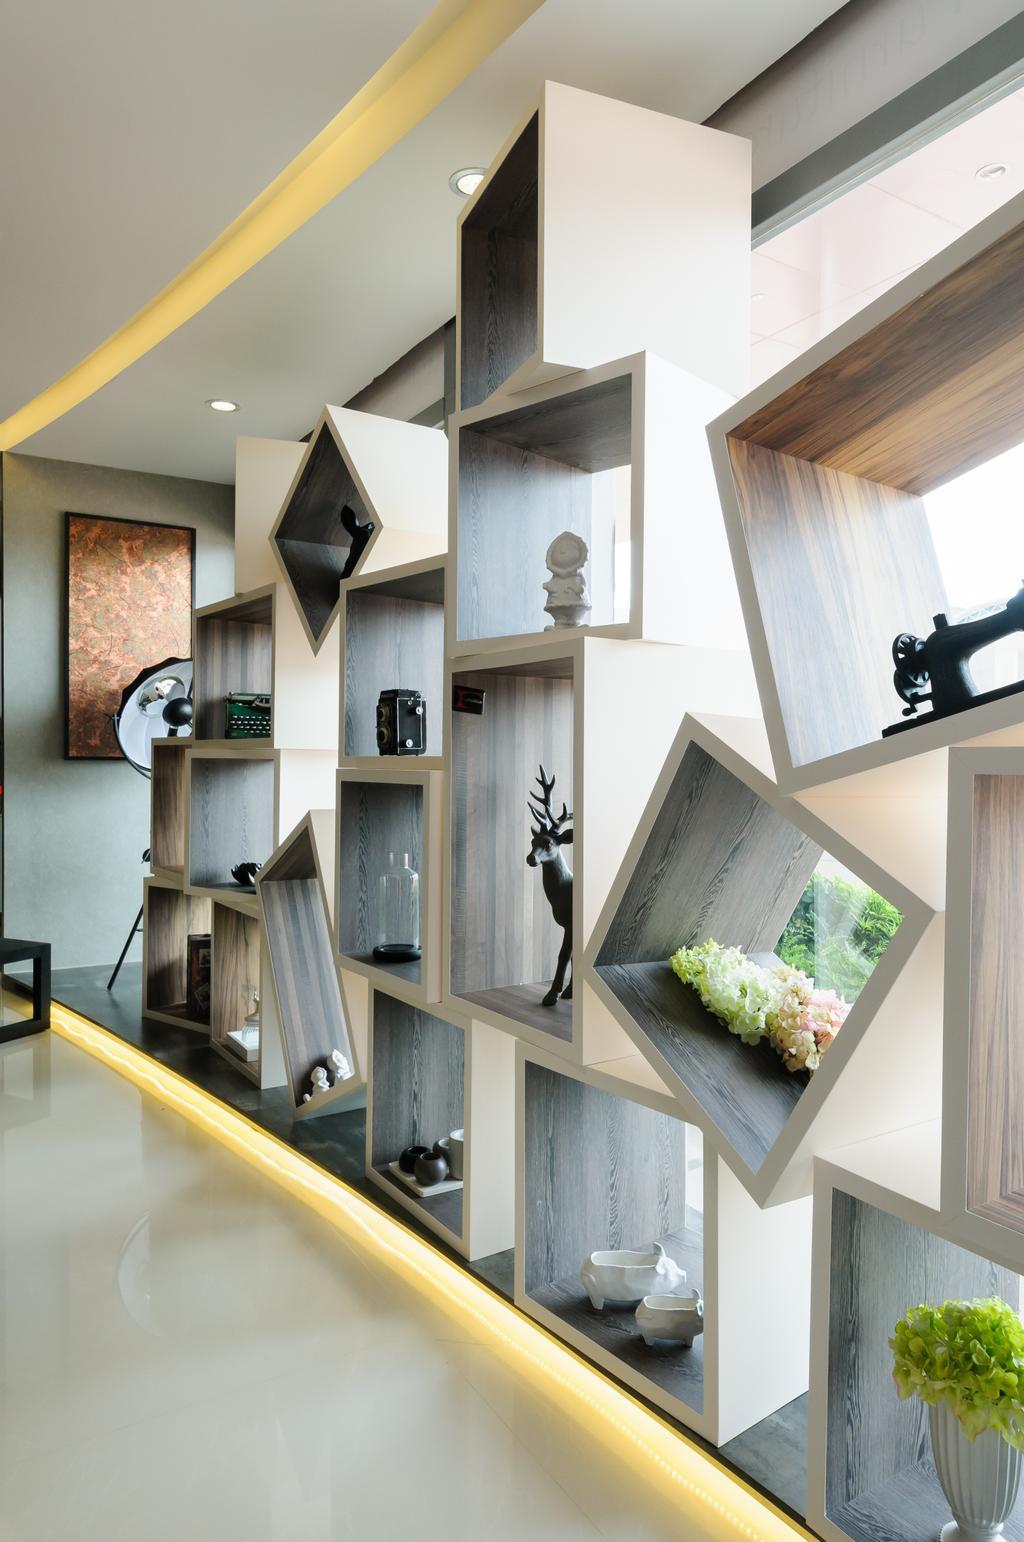 Starry Homestead Studio, Commercial, Interior Designer, Starry Homestead, Eclectic, Living Room, Square Shelf, Display, Concealed Lighting, Indoors, Interior Design